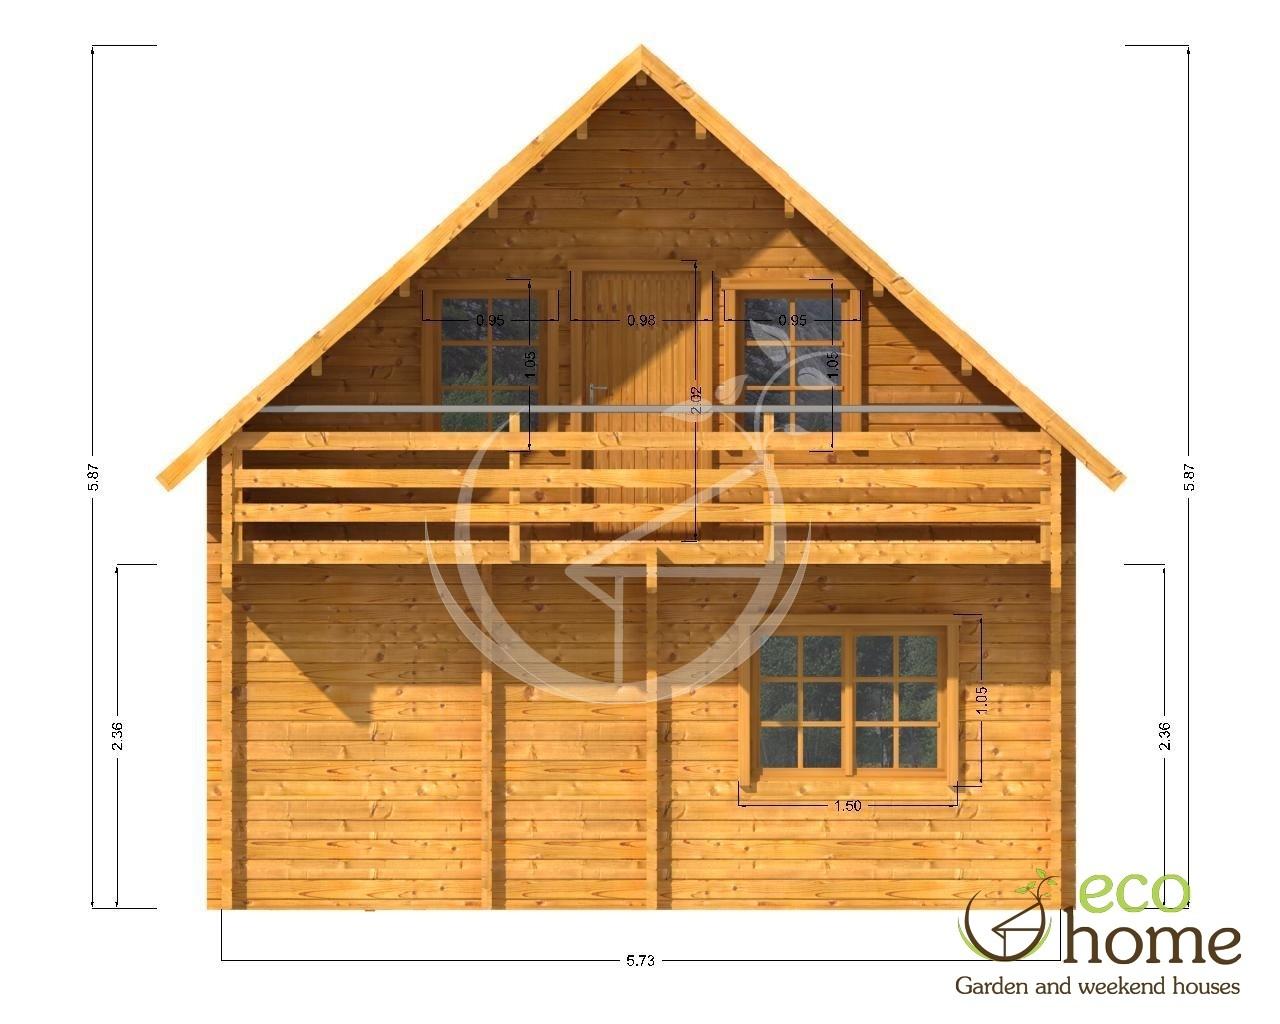 Eco home log cabins ireland name two storey log cabin for Two storey log cabin